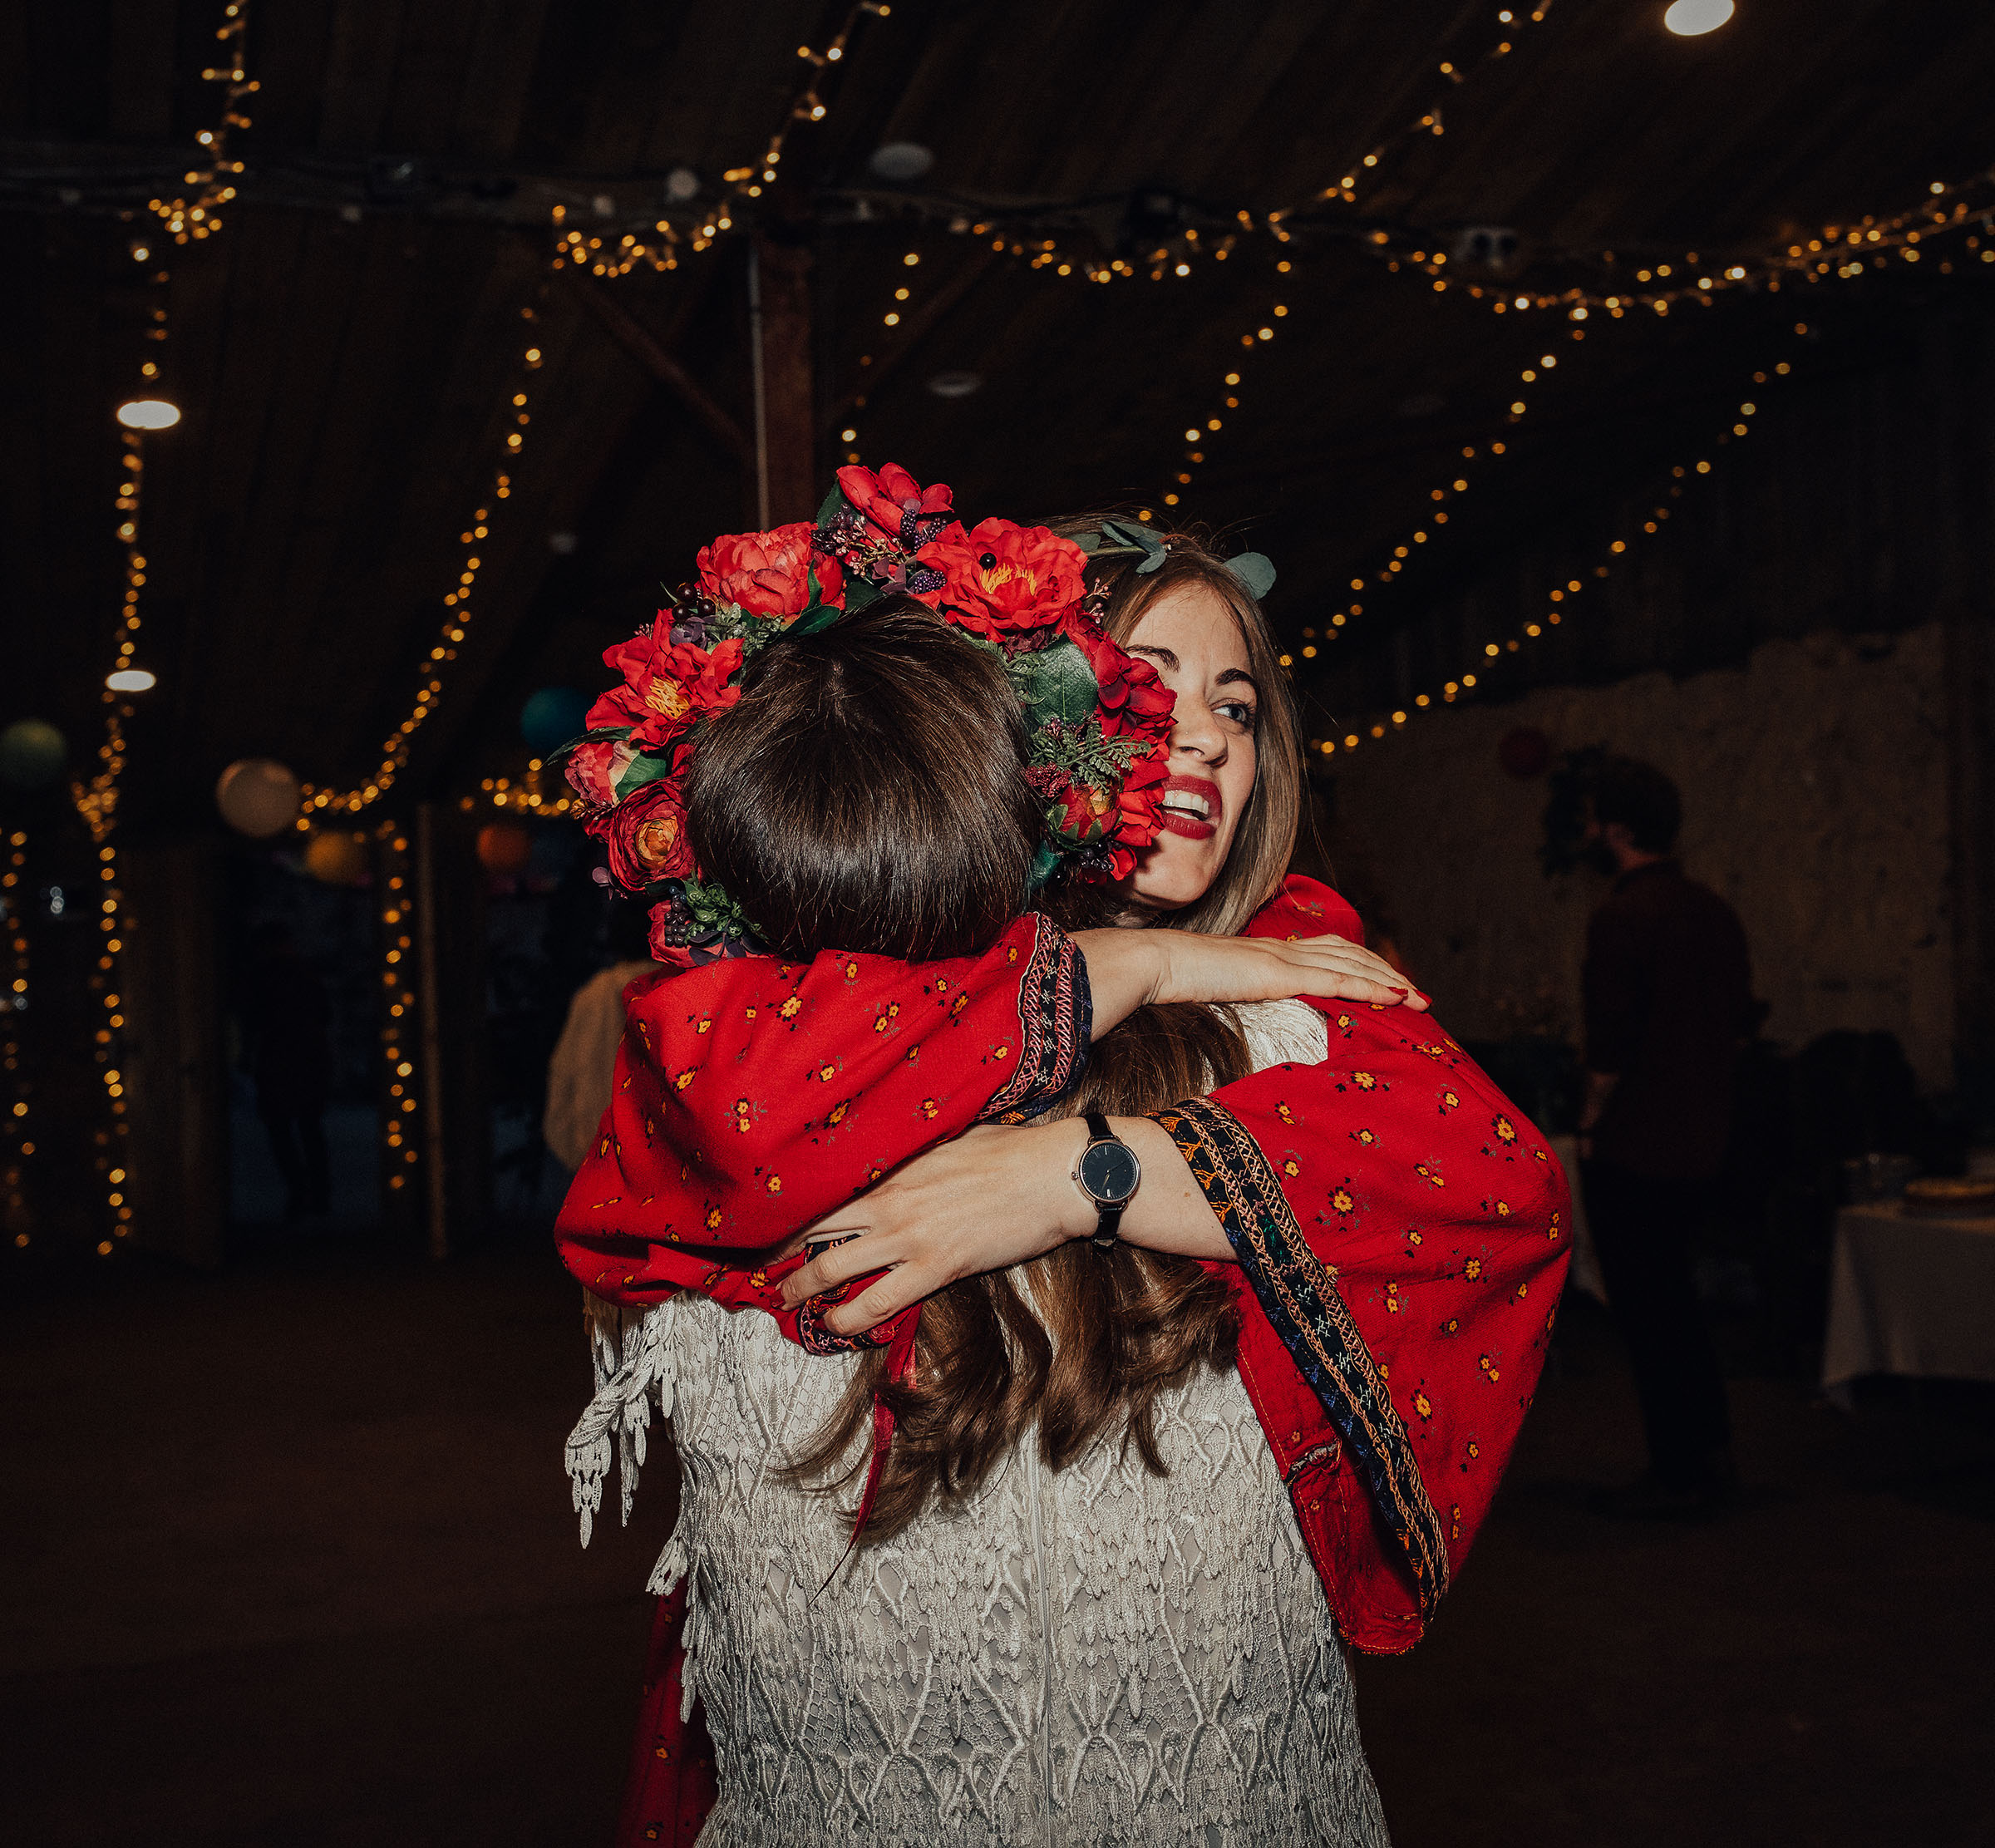 COMRIE_CROFT_WEDDINGS_PJ_PHILLIPS_PHOTOGRAPHY_174.jpg